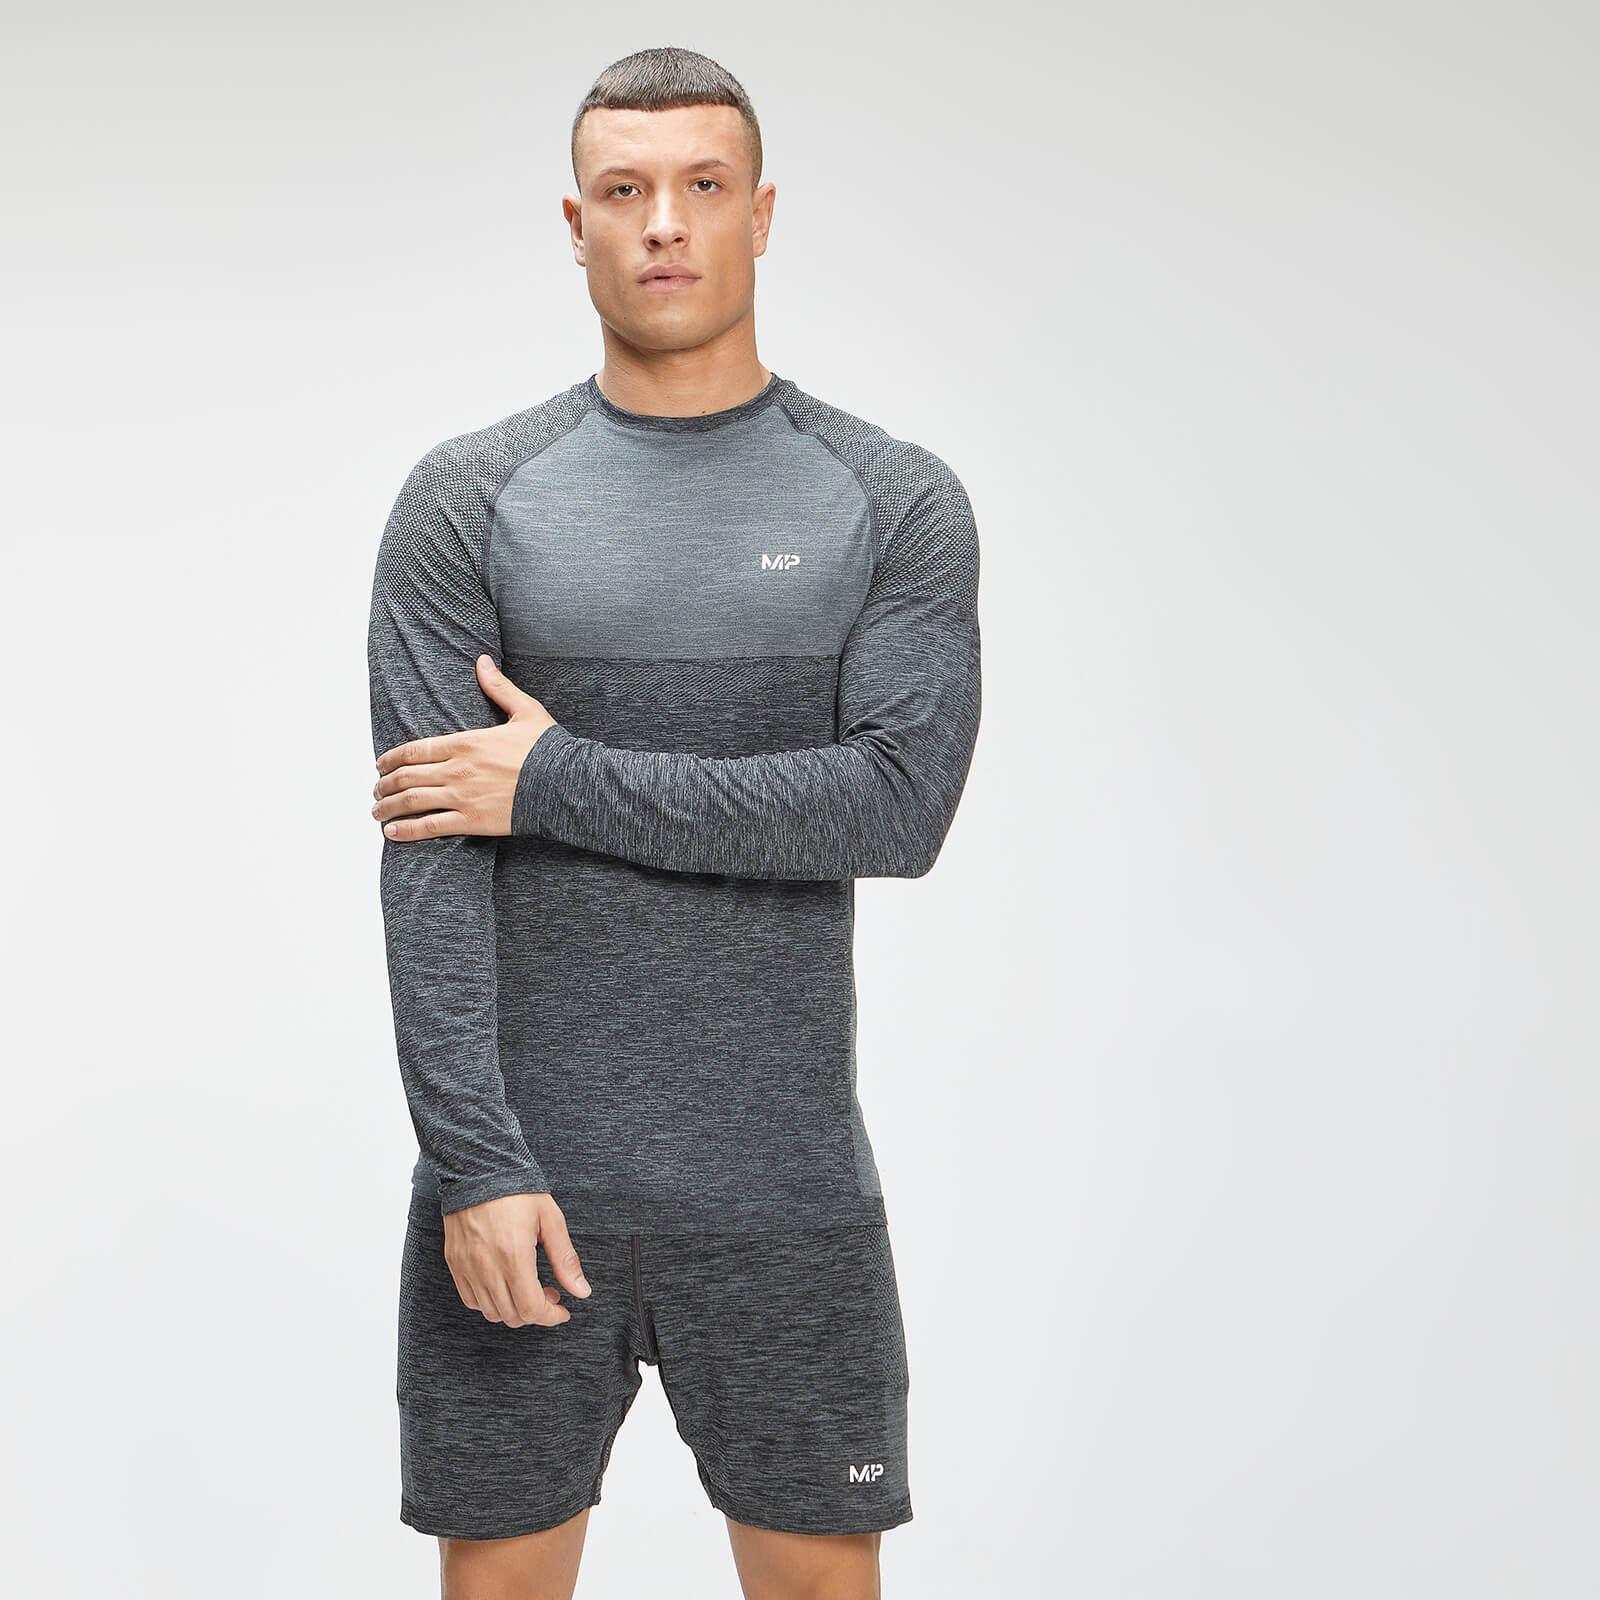 Купить MP Men's Essential Seamless Long Sleeve Top - Black Marl - XS, Myprotein International